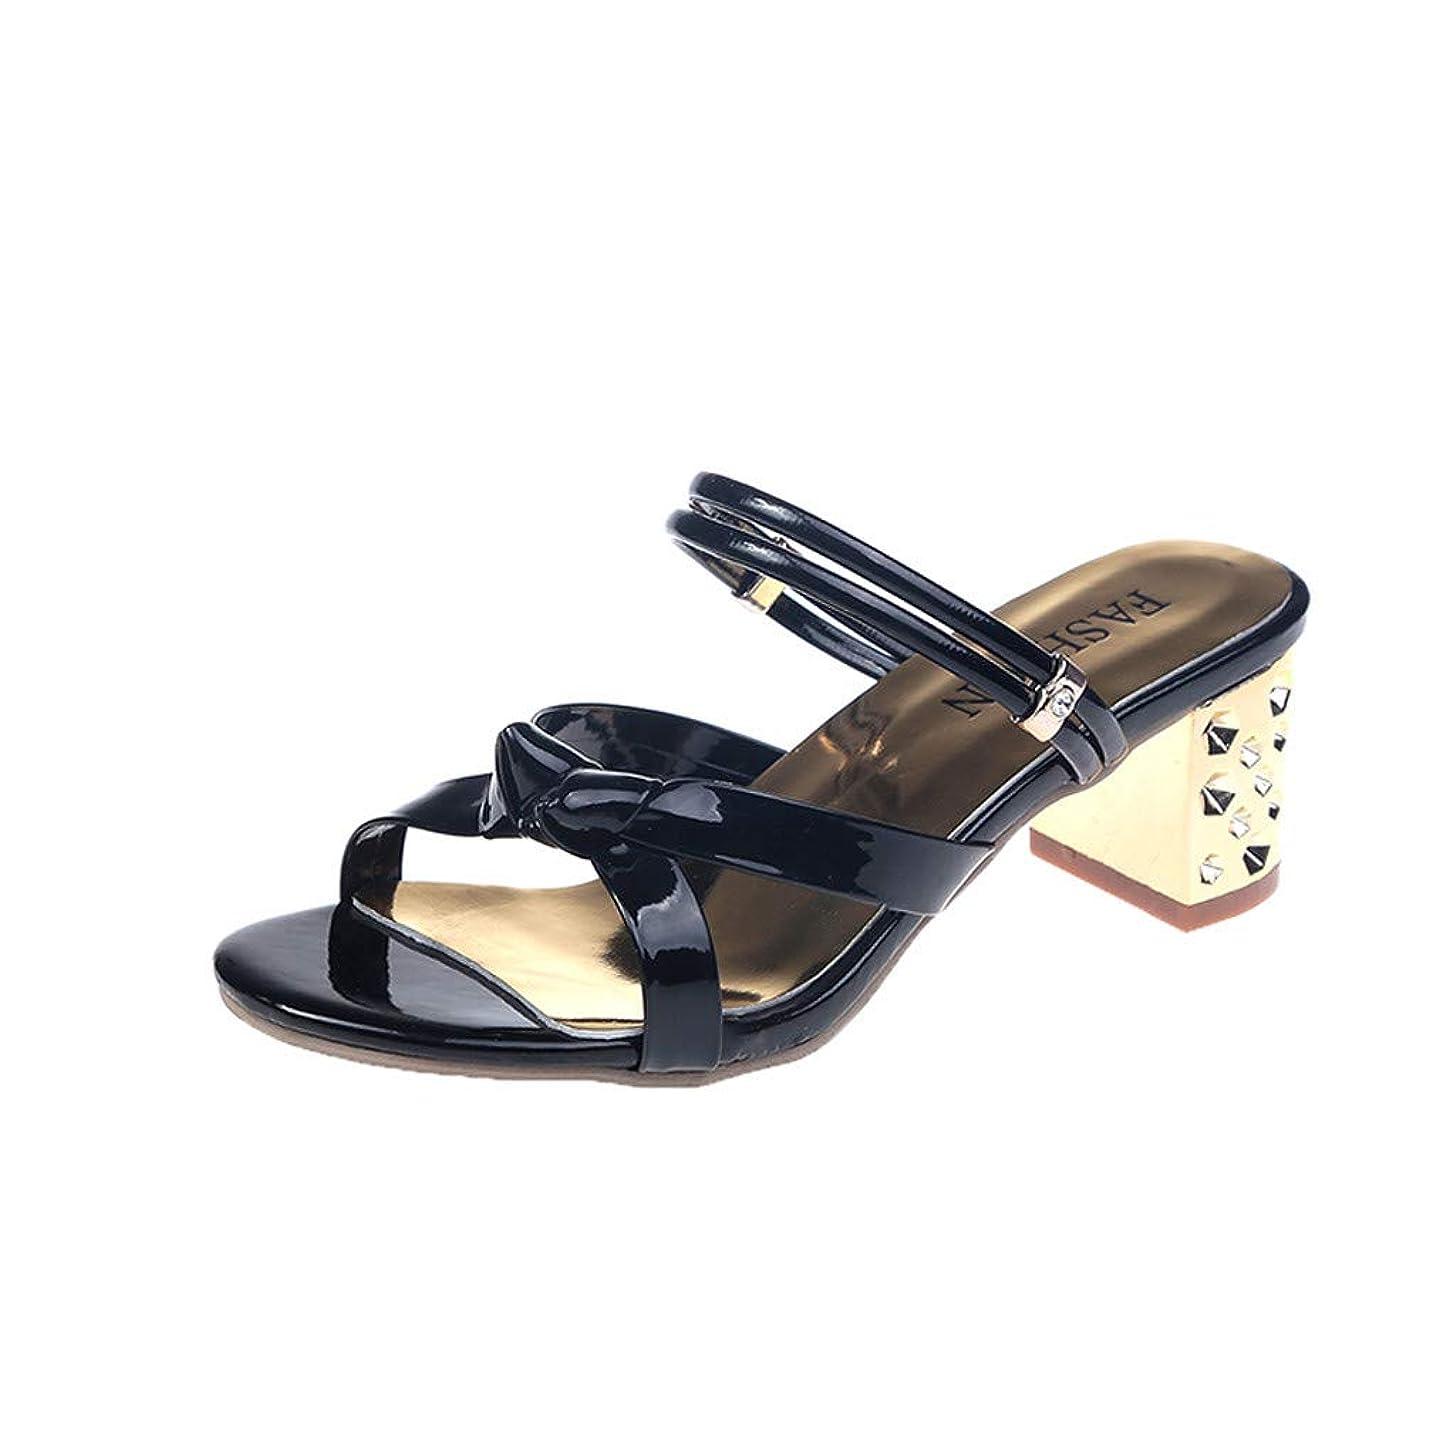 Women's Fashion Knot Square Heel Peep Toe Sandals Casual Beach Rhinestone Chunky Pumps Slip On Slippers JHKUNO